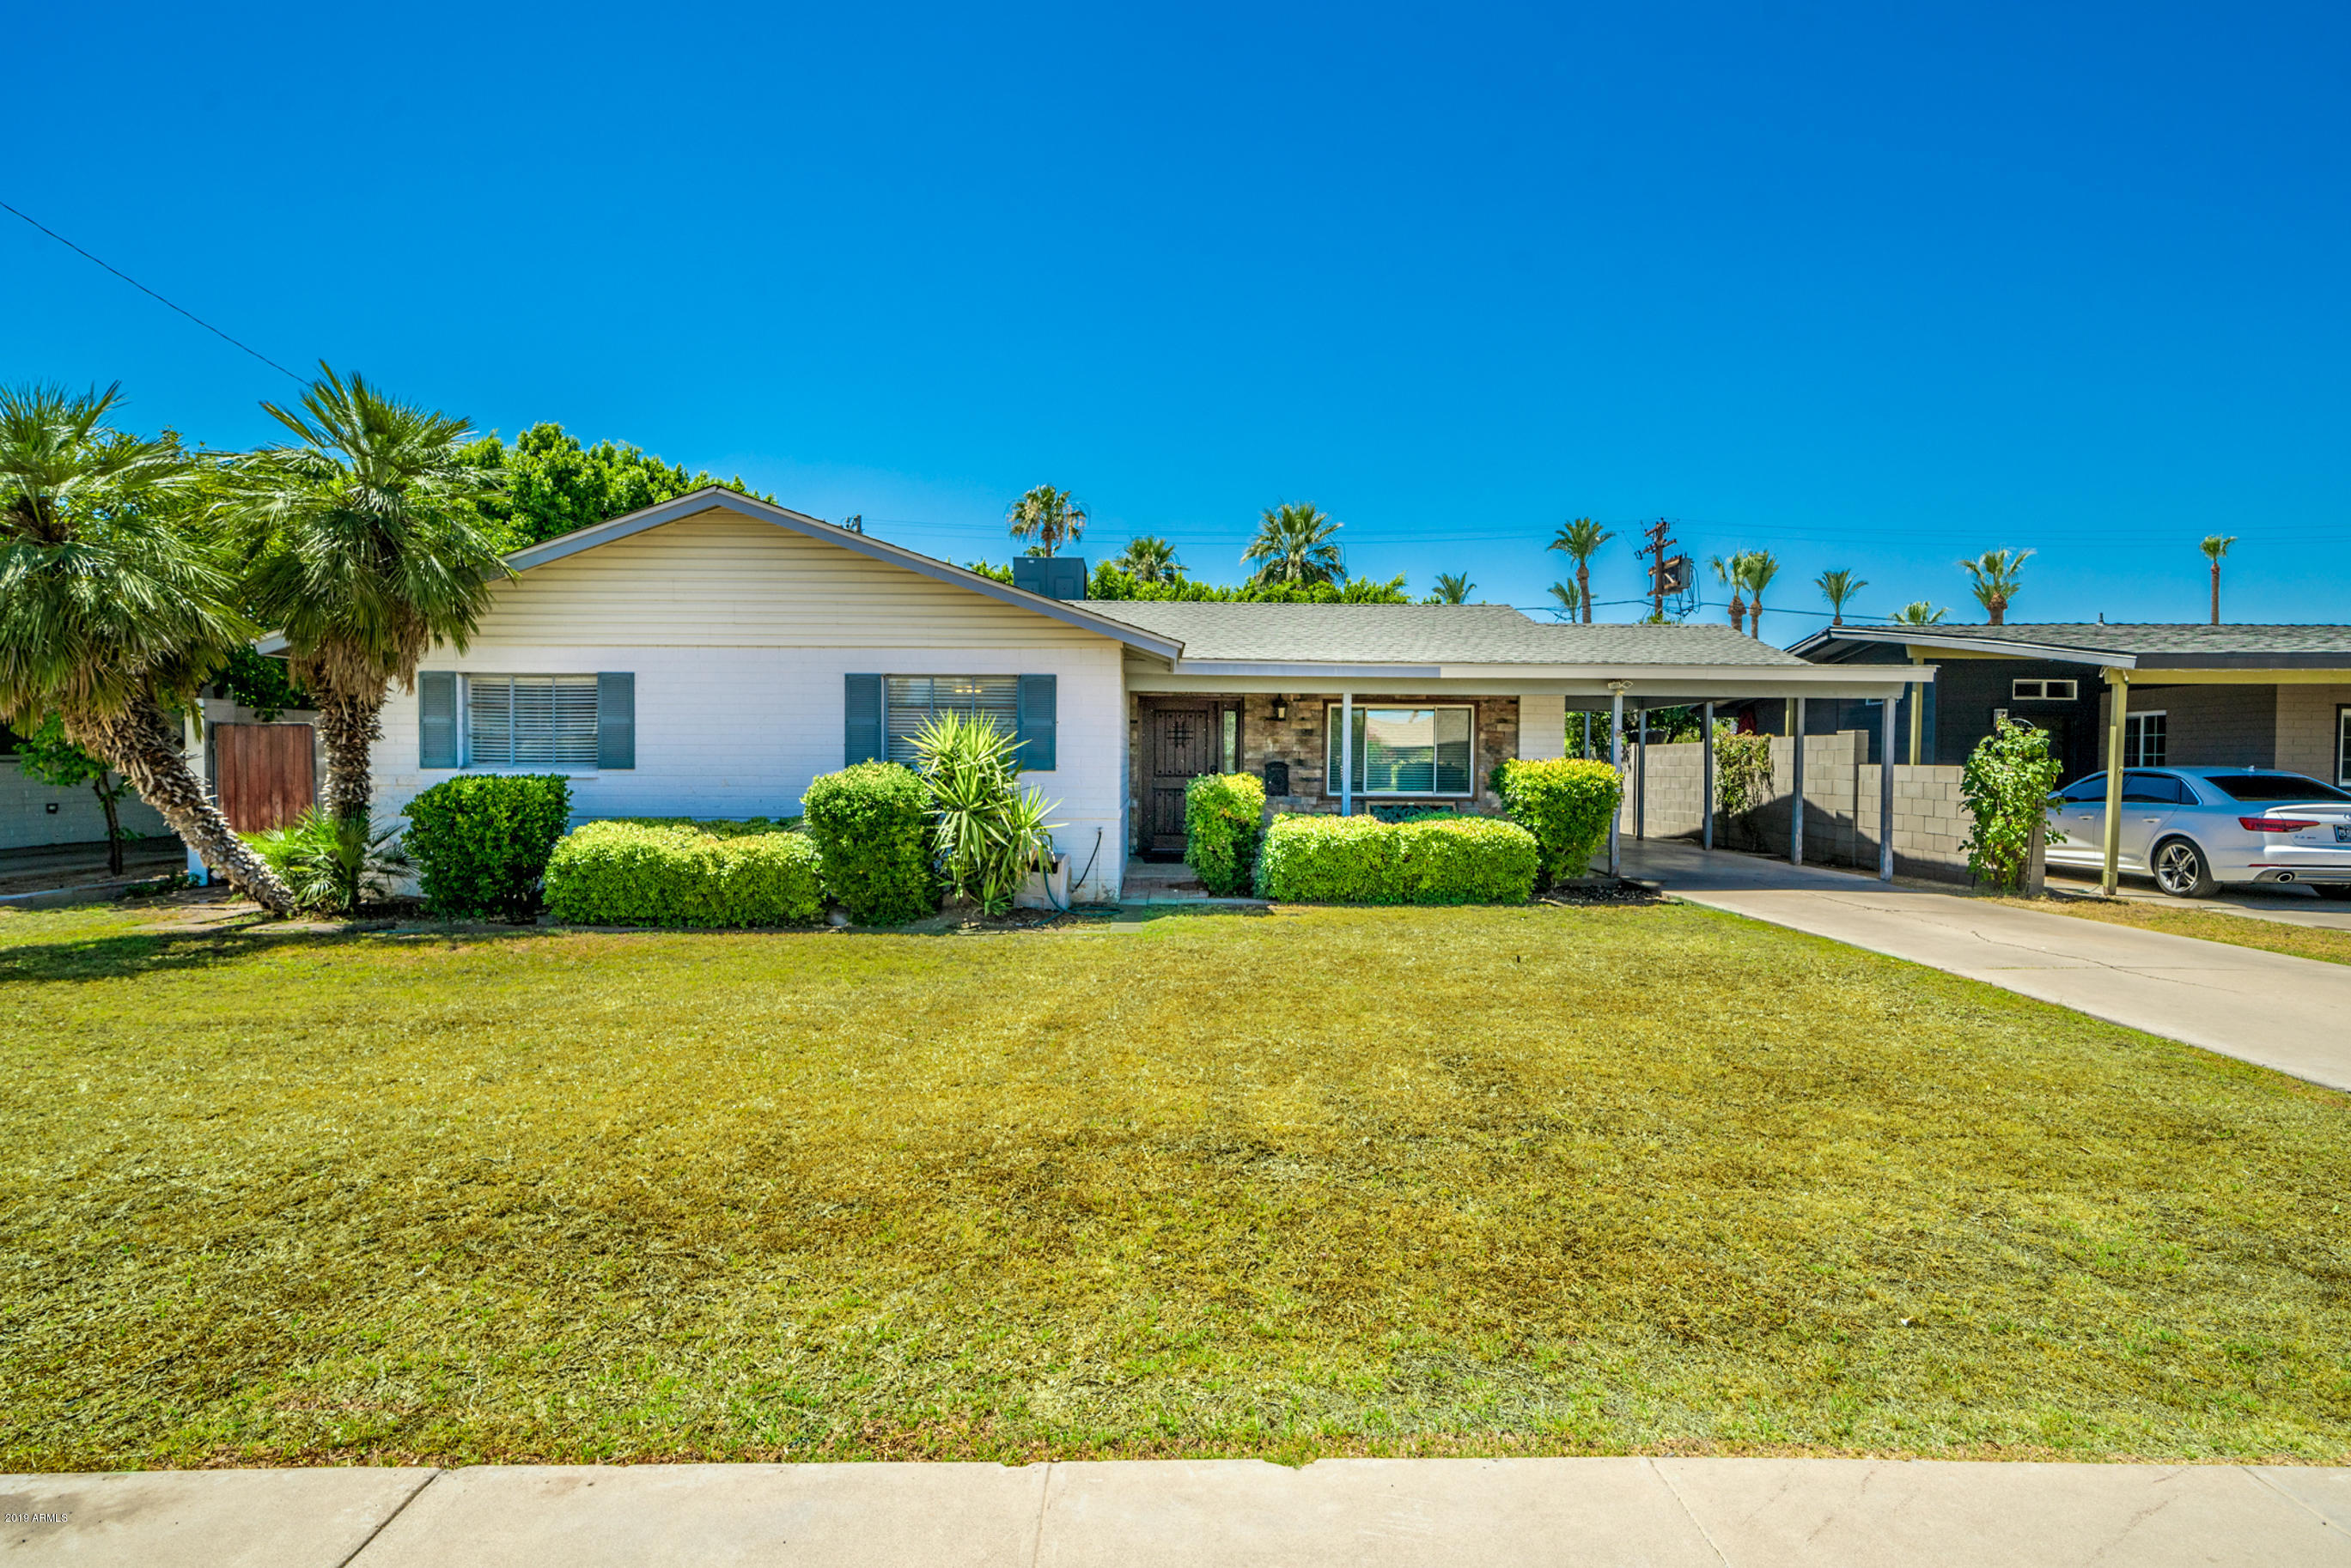 Photo for 439 W Cheery Lynn Road, Phoenix, AZ 85013 (MLS # 5946643)